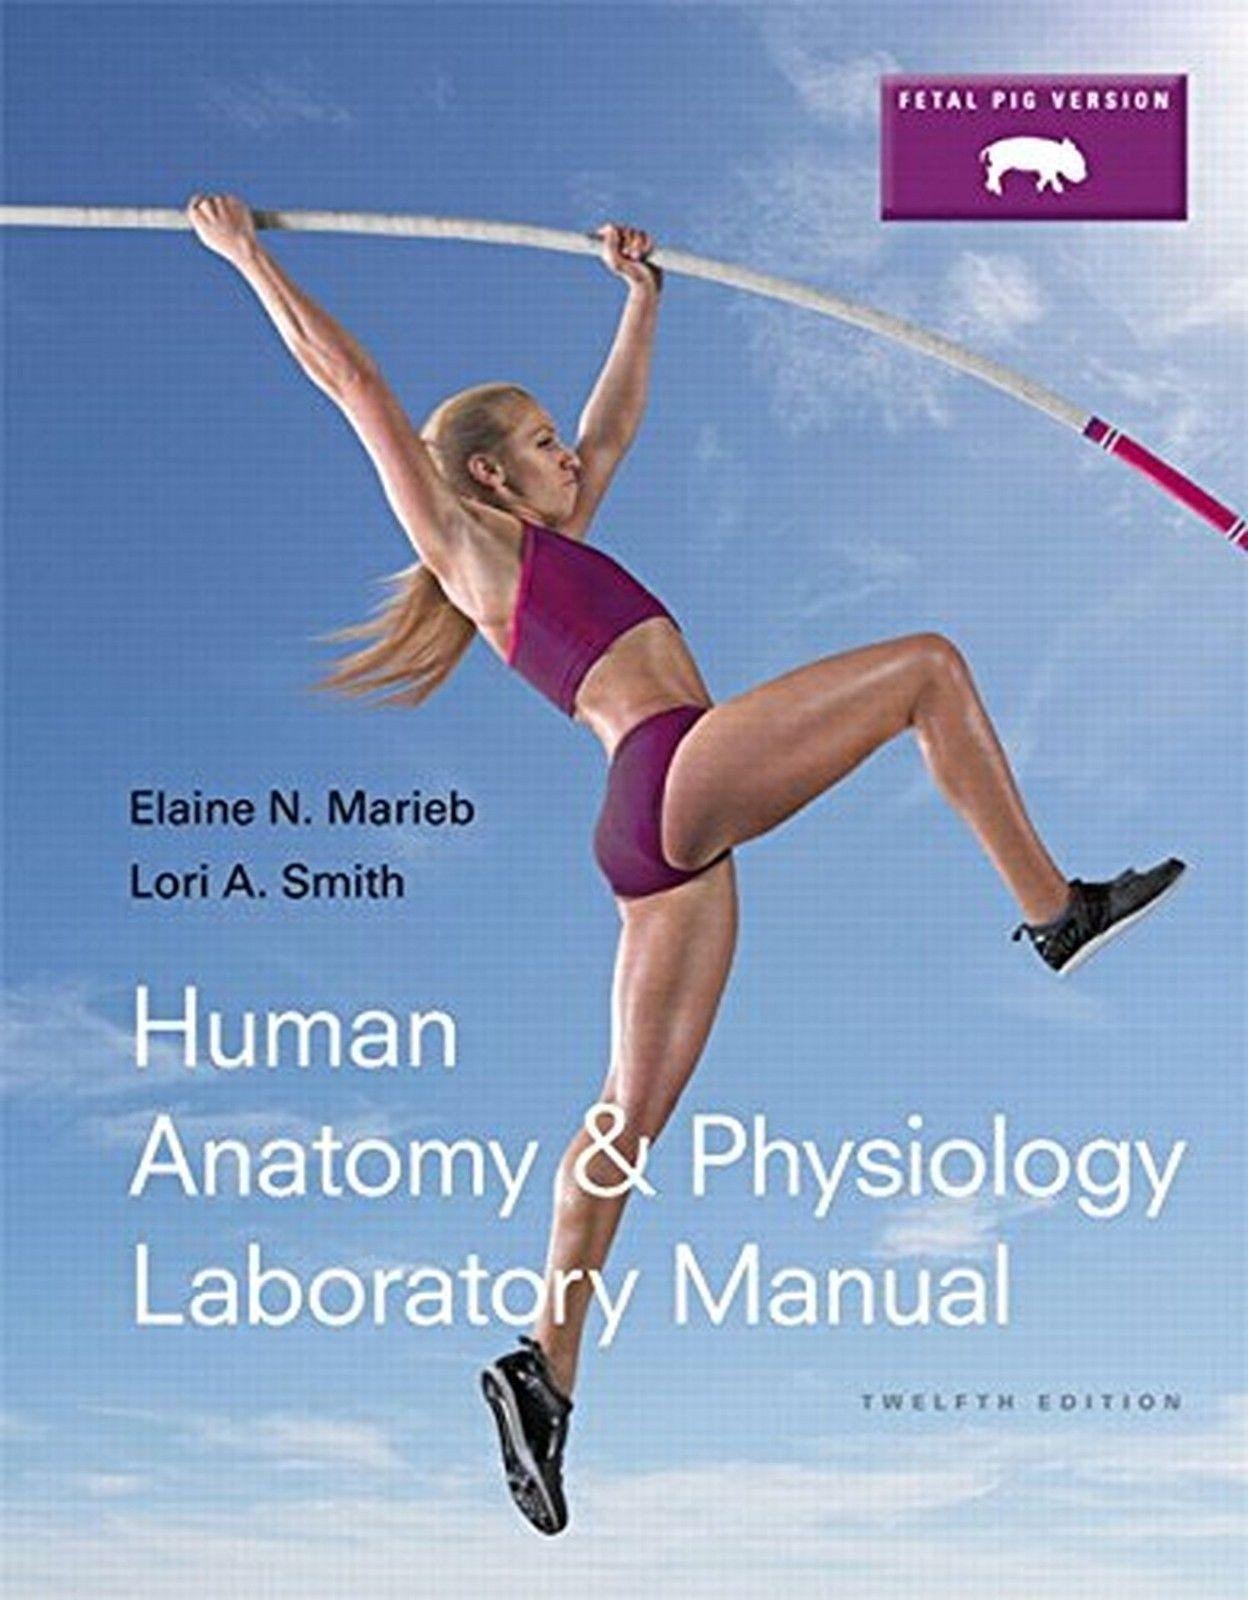 Human Anatomy & Physiology Laboratory Manual Fetal Pig Version (12Th ...